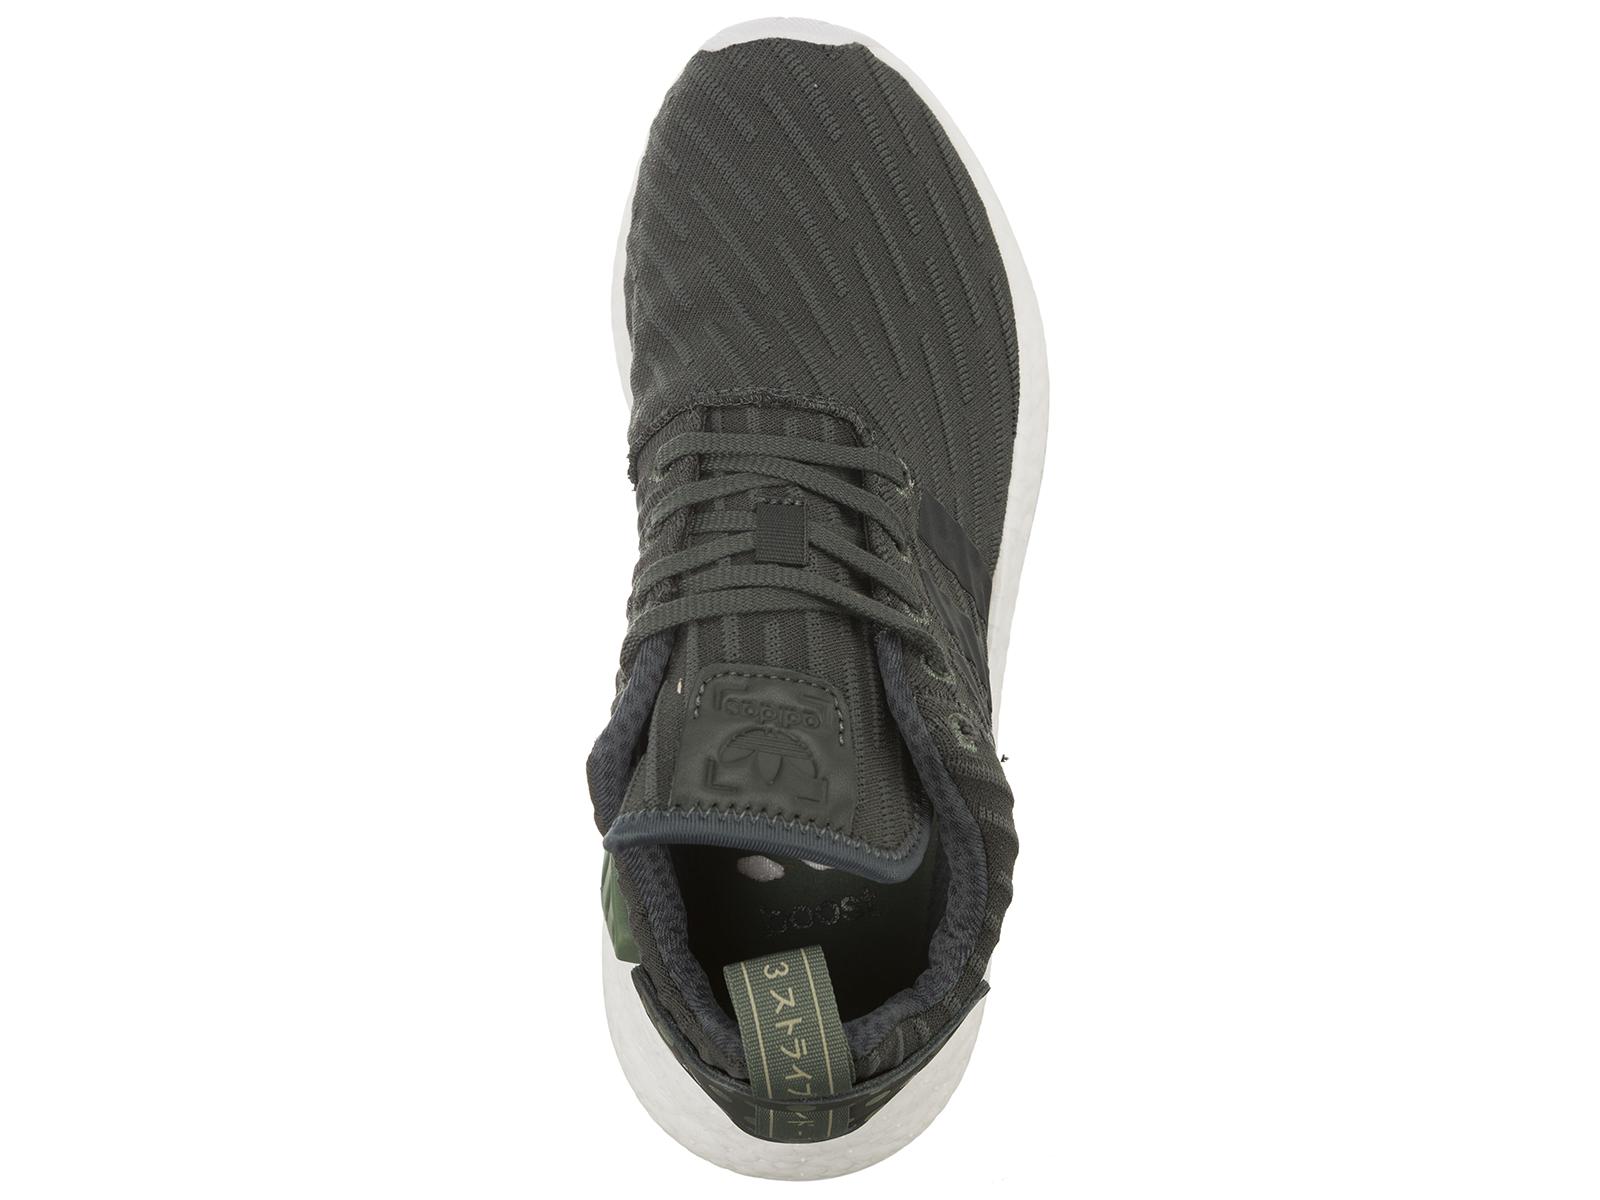 Originals Sneaker Schuhe Details Adidas Kollektion Turnschuhe Unisex 2017 Nmd Zu Yf7vmIyb6g